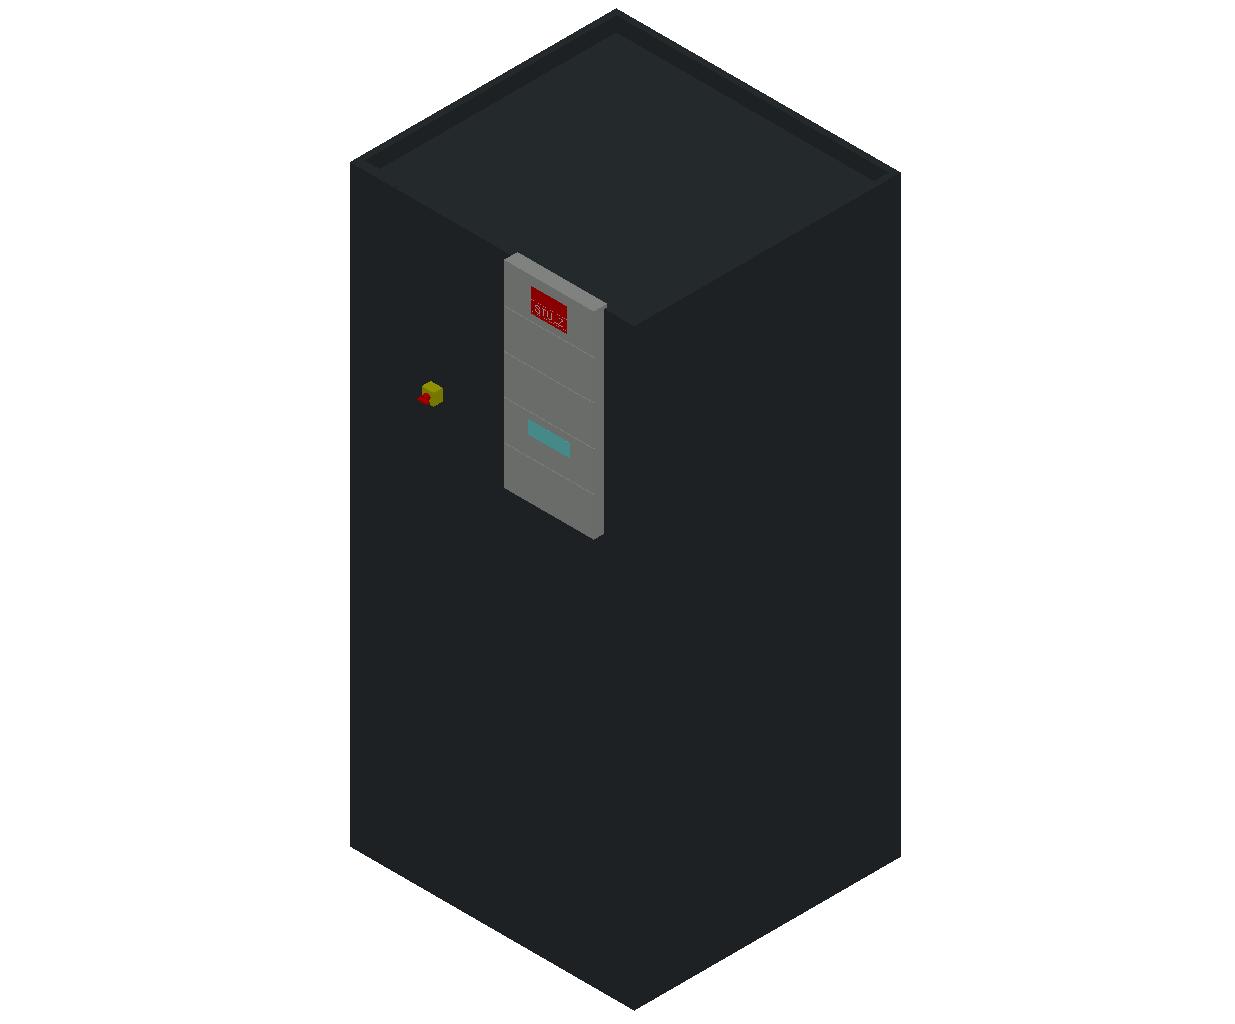 HC_Air Conditioner_Indoor Unit_MEPcontent_STULZ_CyberAir 3PRO_ASD-ALD_Single Circuit GE_ALD_341_GE_INT-EN.dwg